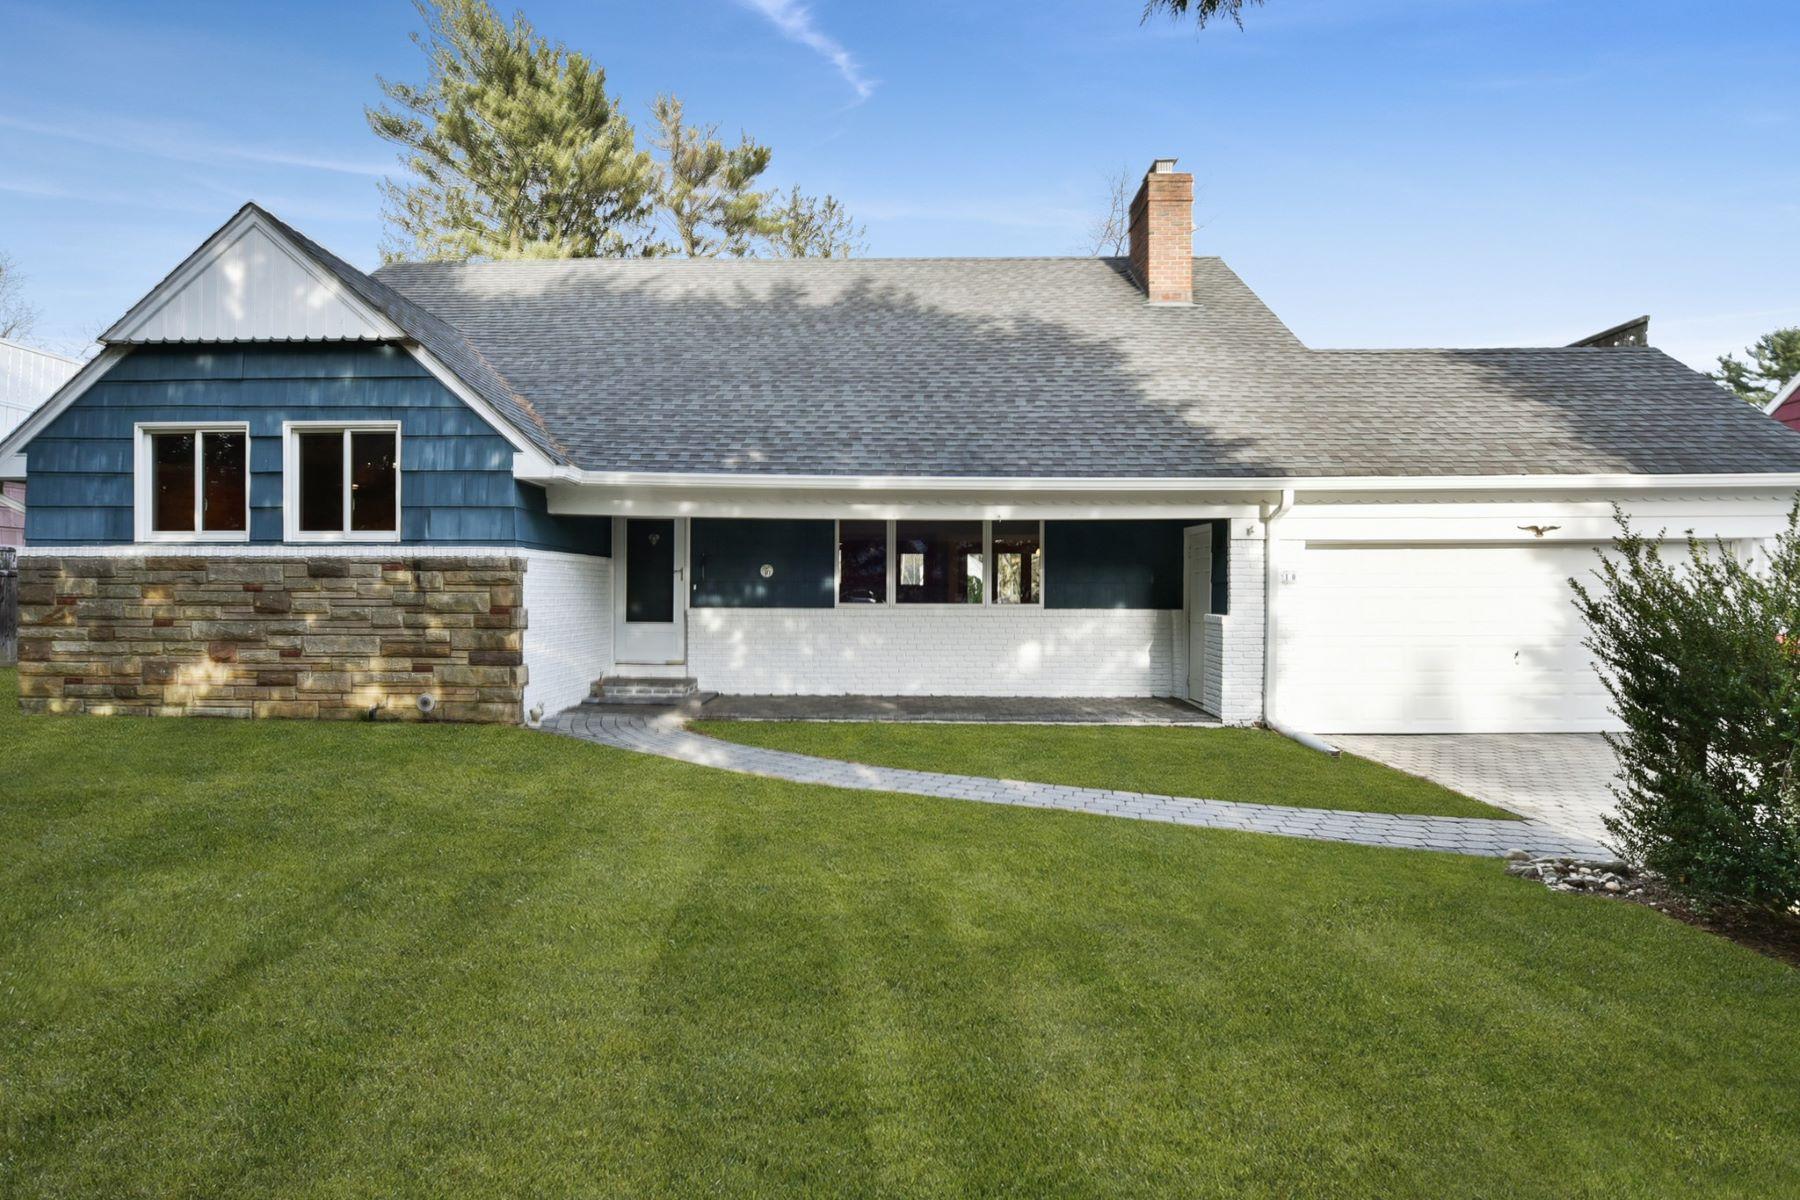 Single Family Homes for Sale at Glen Cove 10 E Stuart Dr, Glen Cove, New York 11542 United States